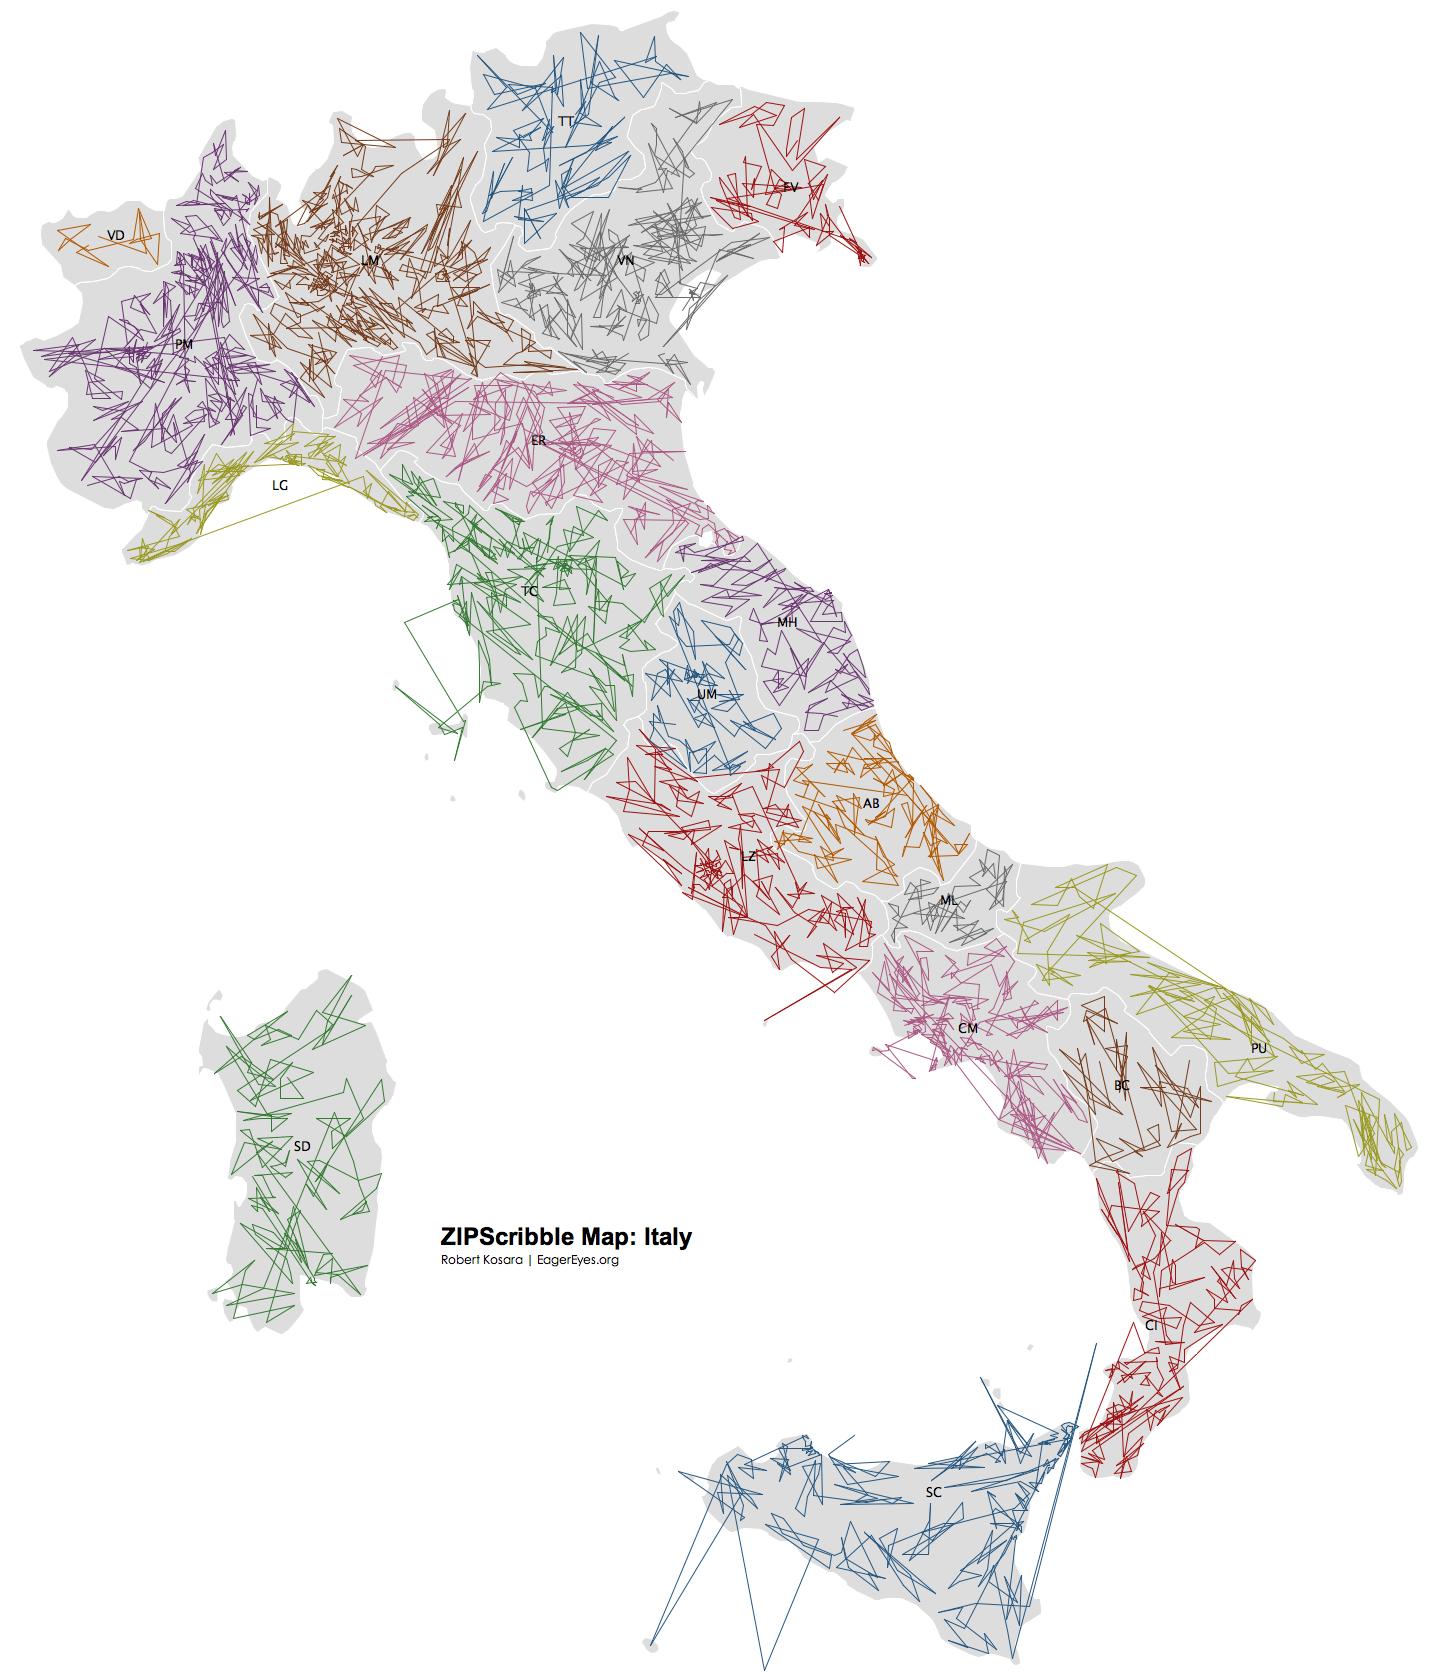 ZIPScribble Map: Italy